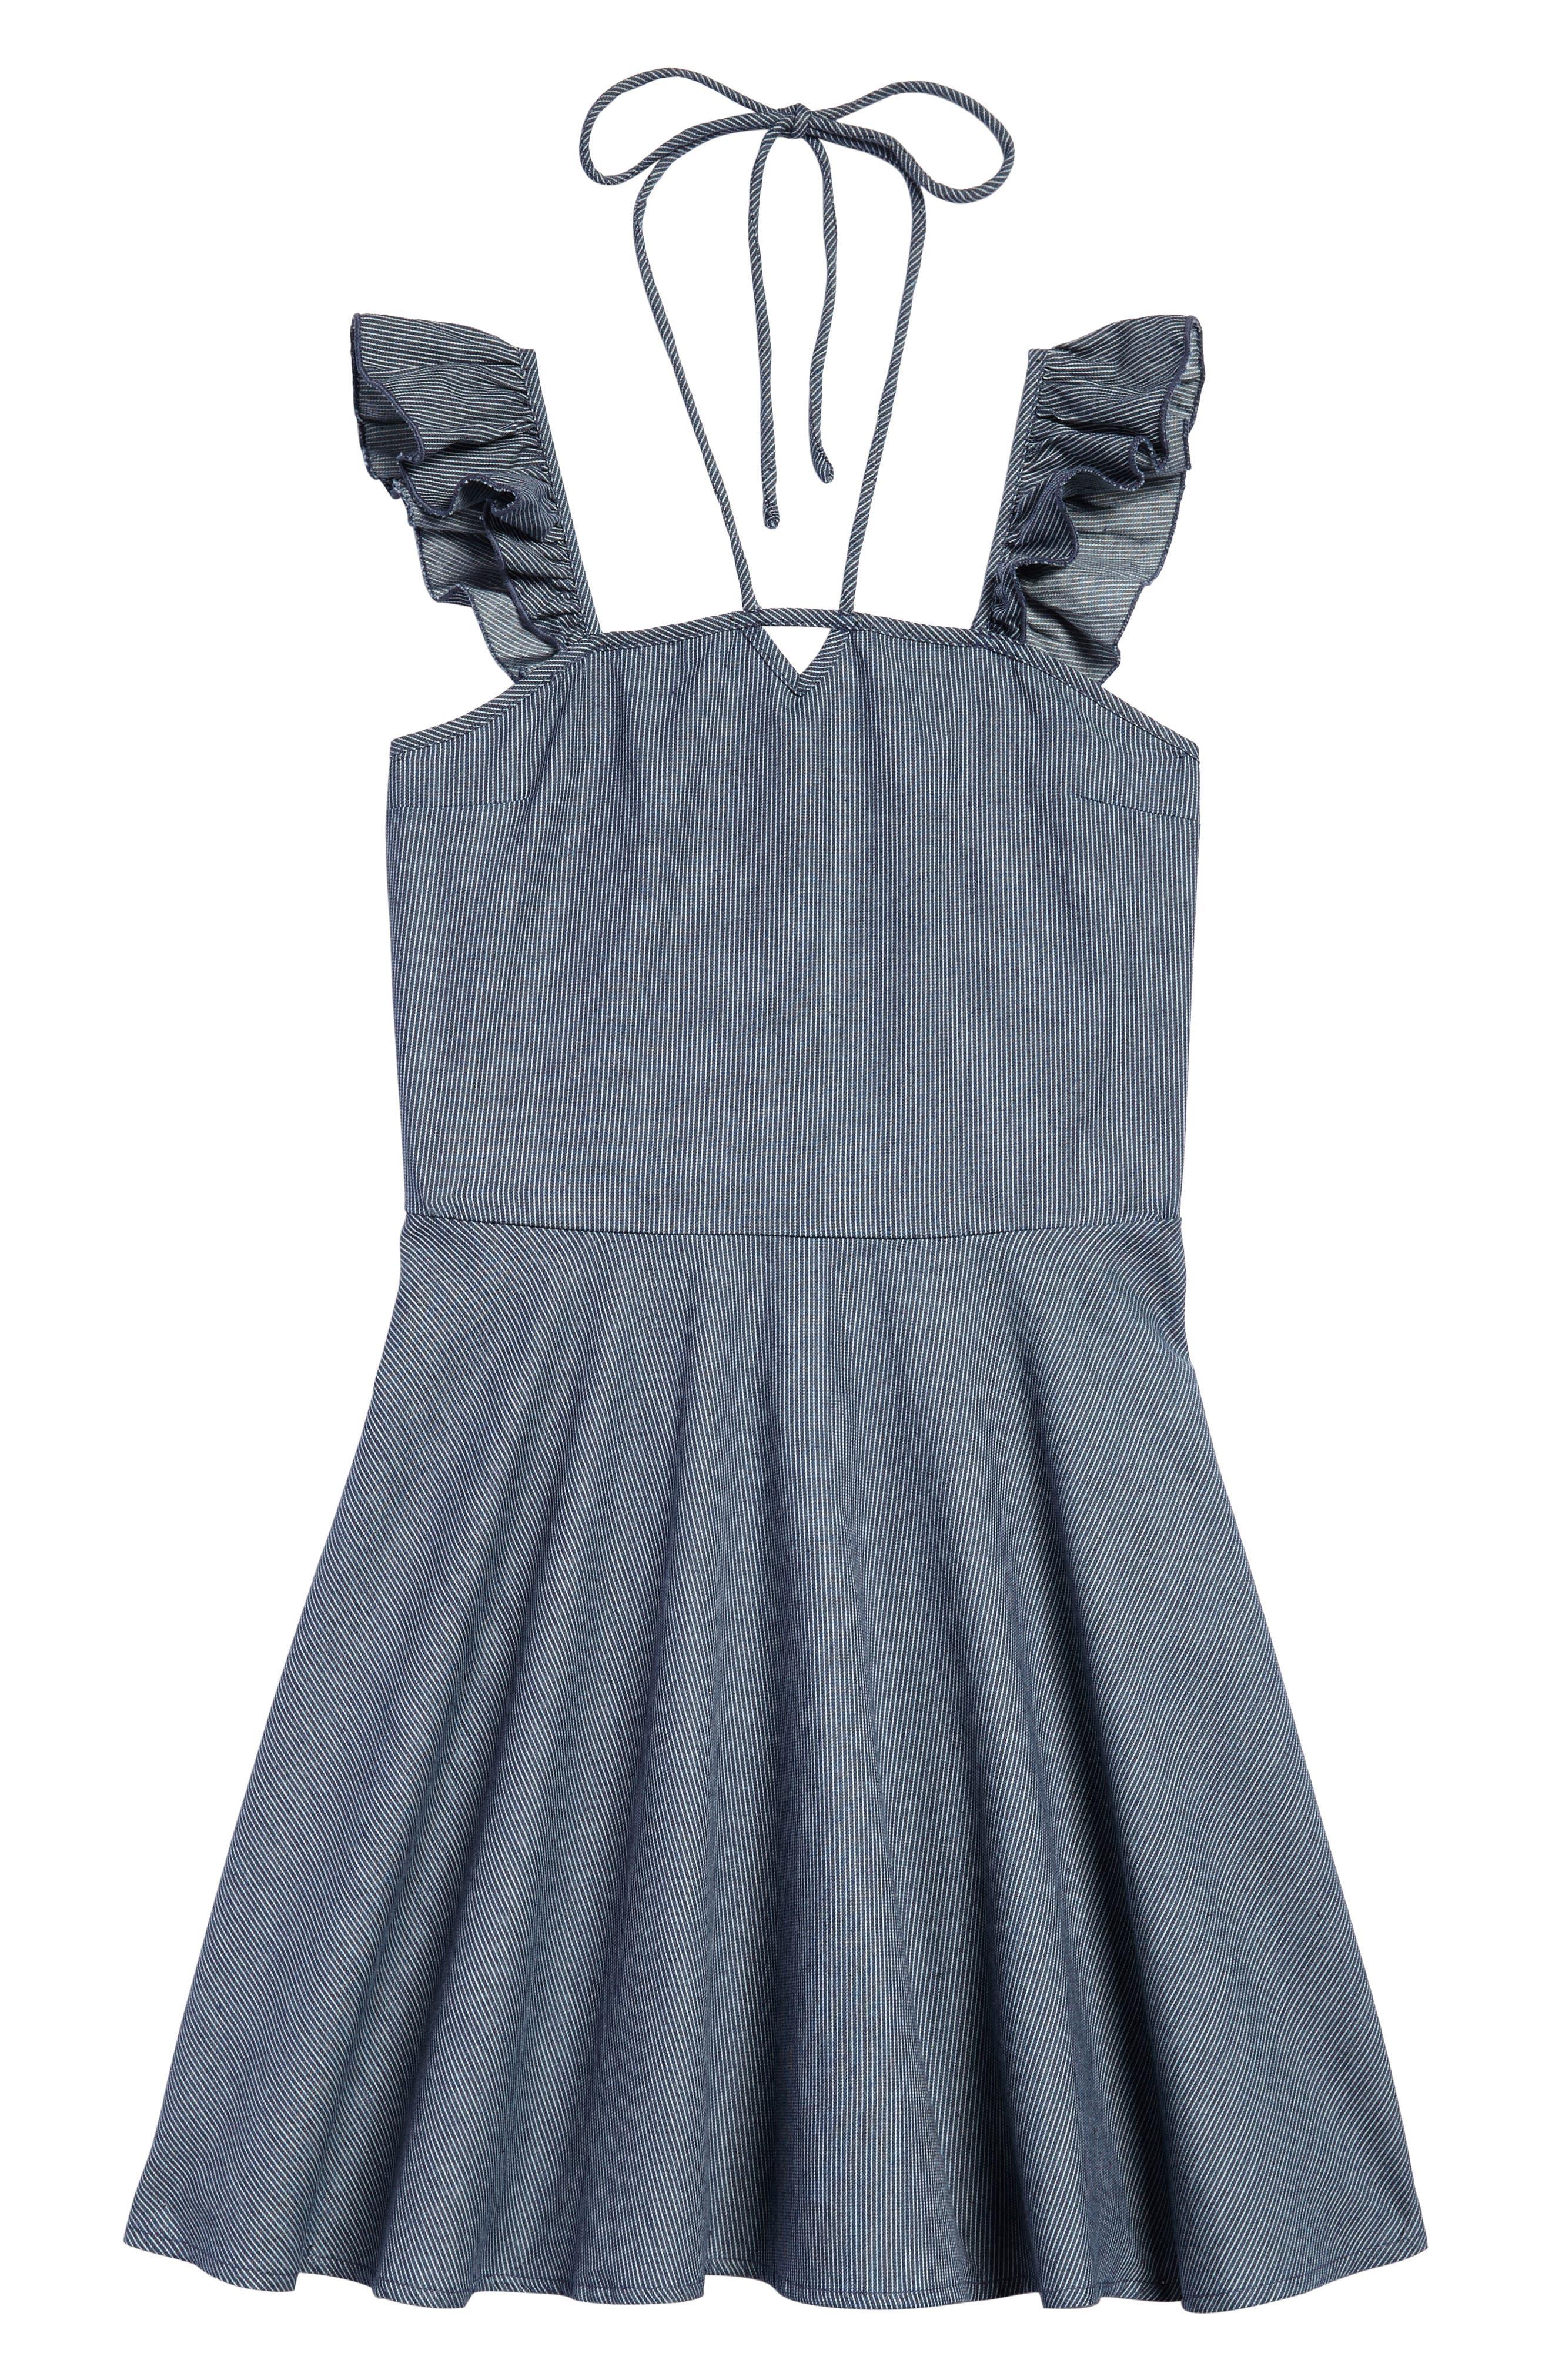 Main Image - Miss Behave Ruffle Shoulder Dress (Big Girls)